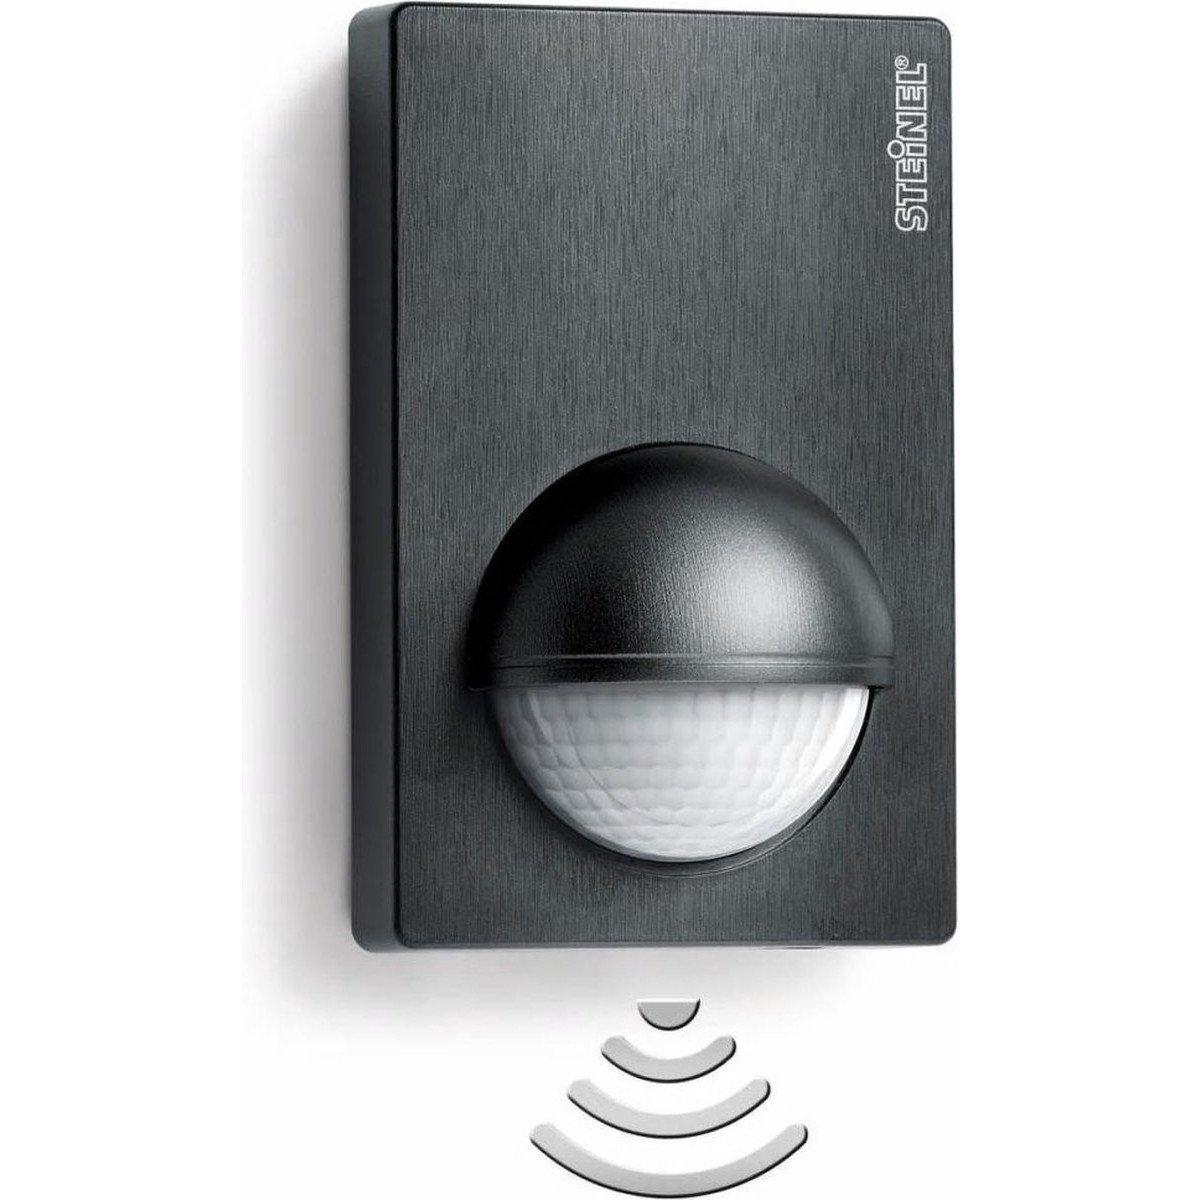 Steinel IS 180-2 bewegingsmelder zwart (603113) - Steinel - Losse Sensoren en Bewegingsmelders